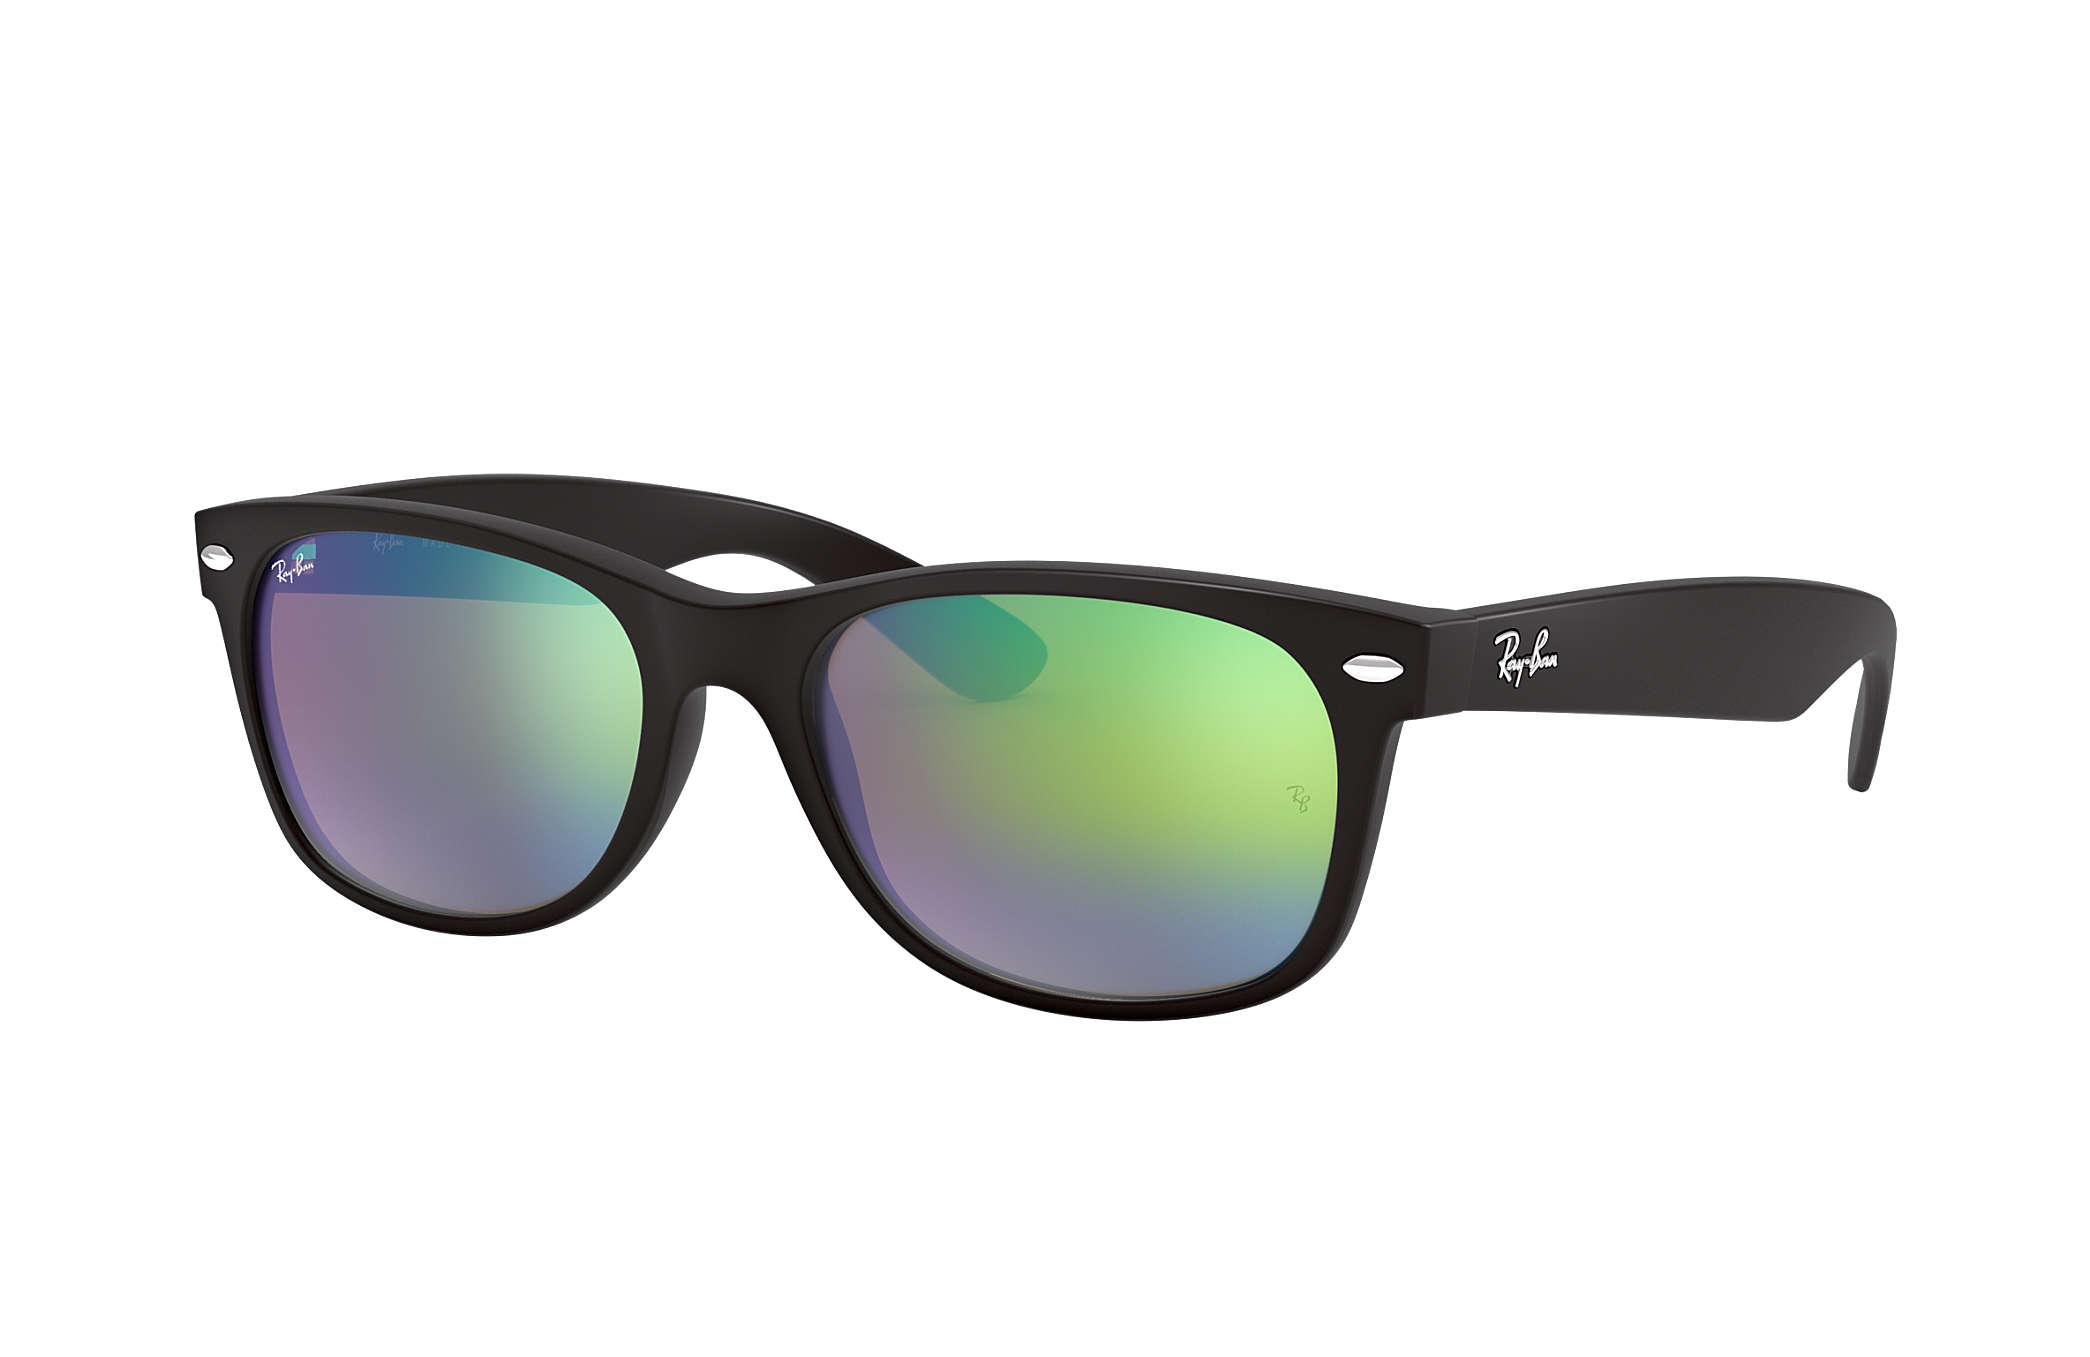 ray-ban new wayfarer flash lenses sunglasses